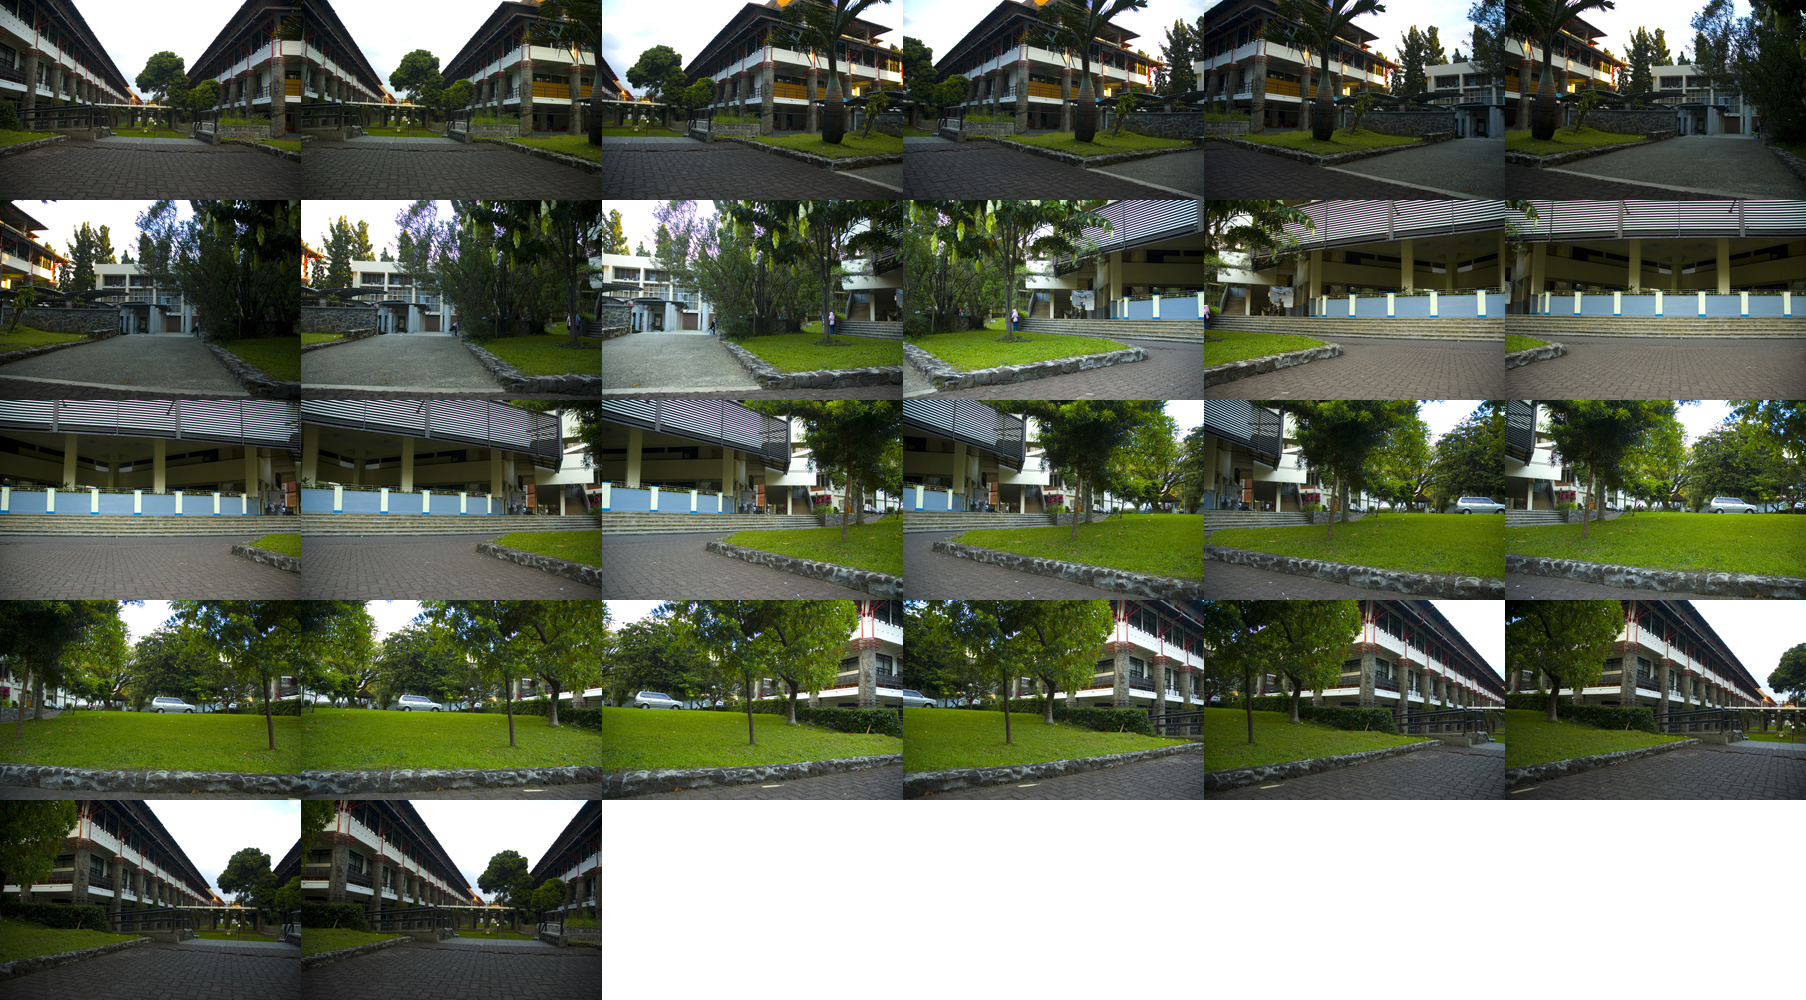 rangkaian image hasil rotation method